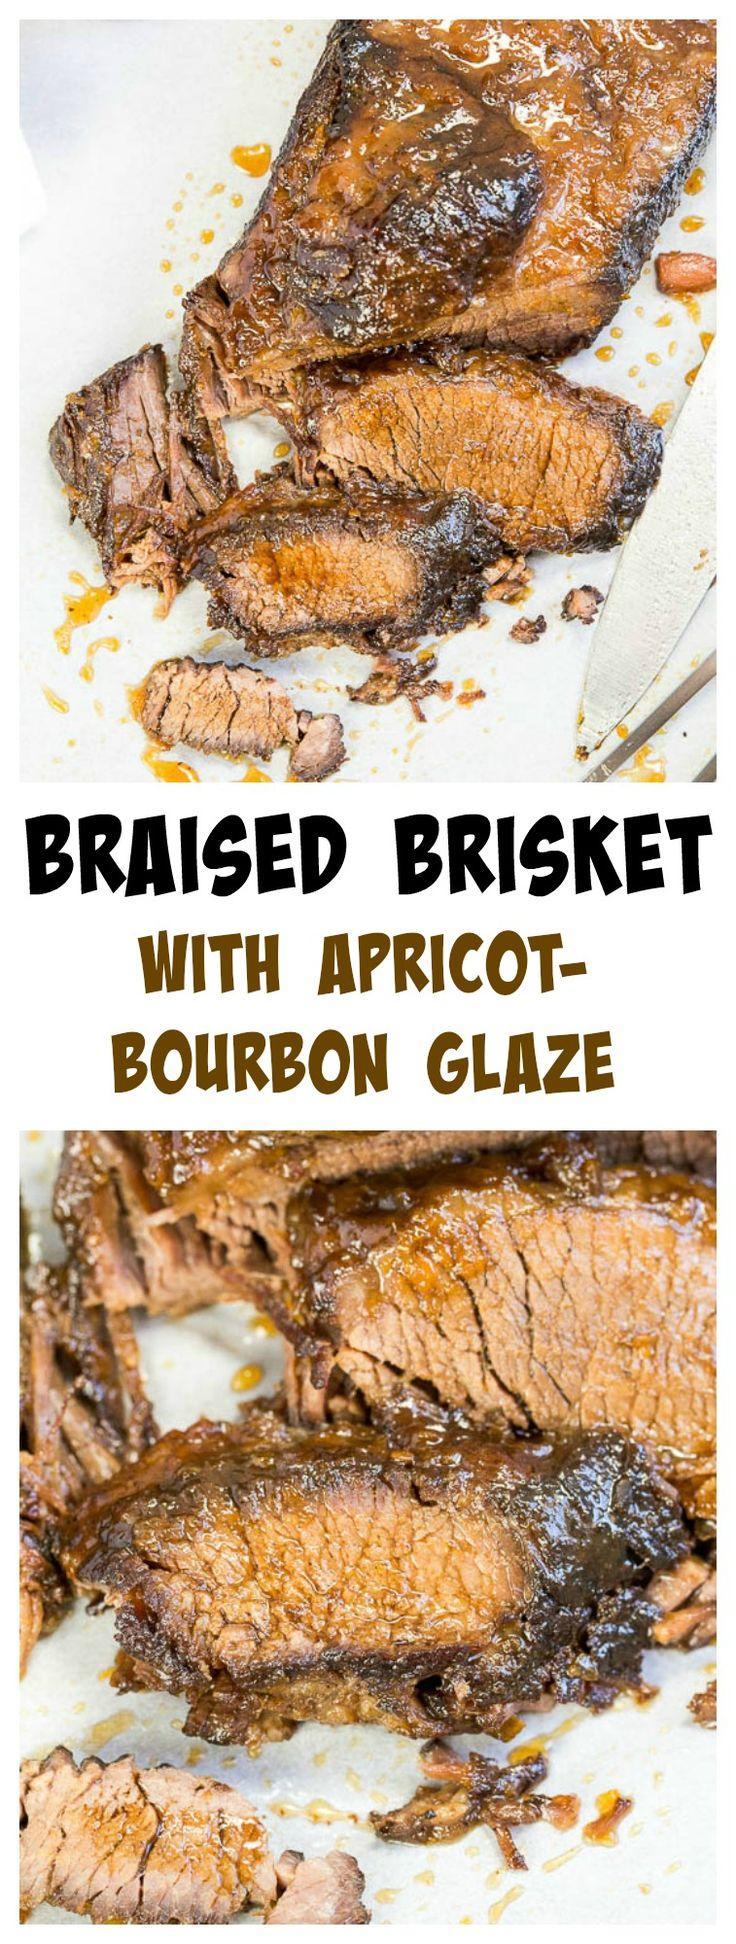 Braised Brisket with Apricot-Bourbon Glaze